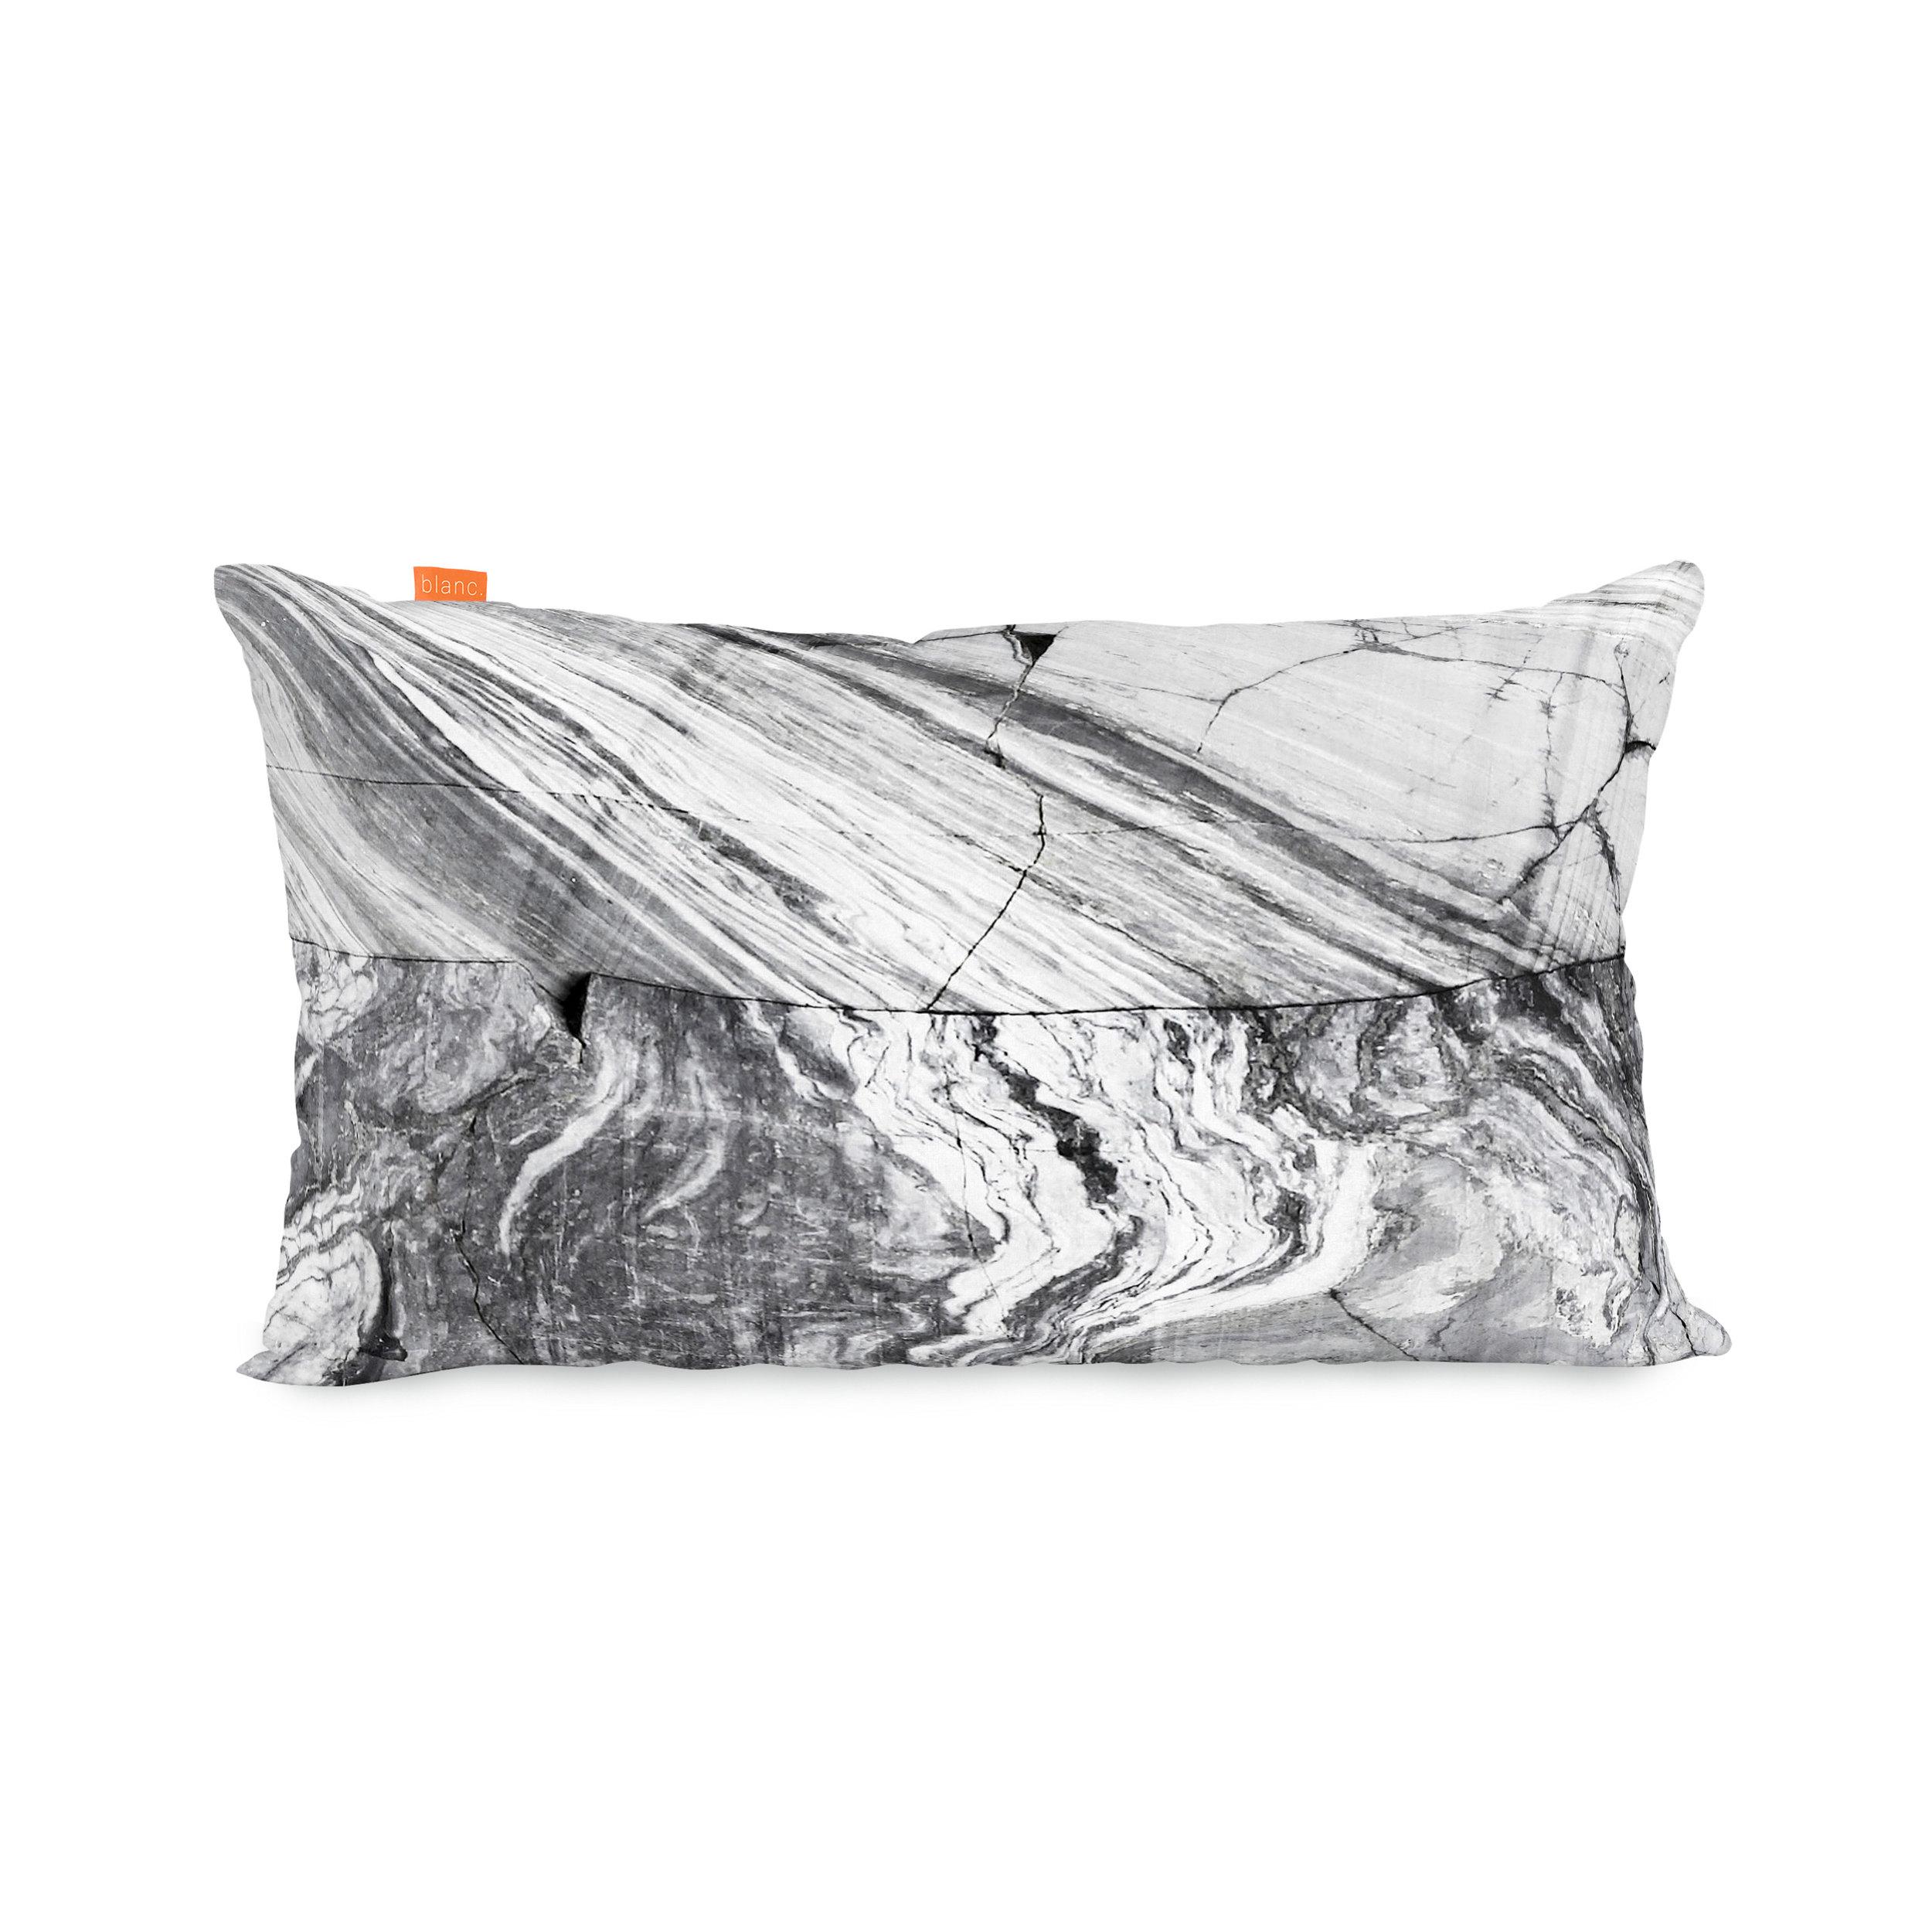 30003787_01_Blanc-Essence-Marble-Oblong-Cushion-Cover.jpg